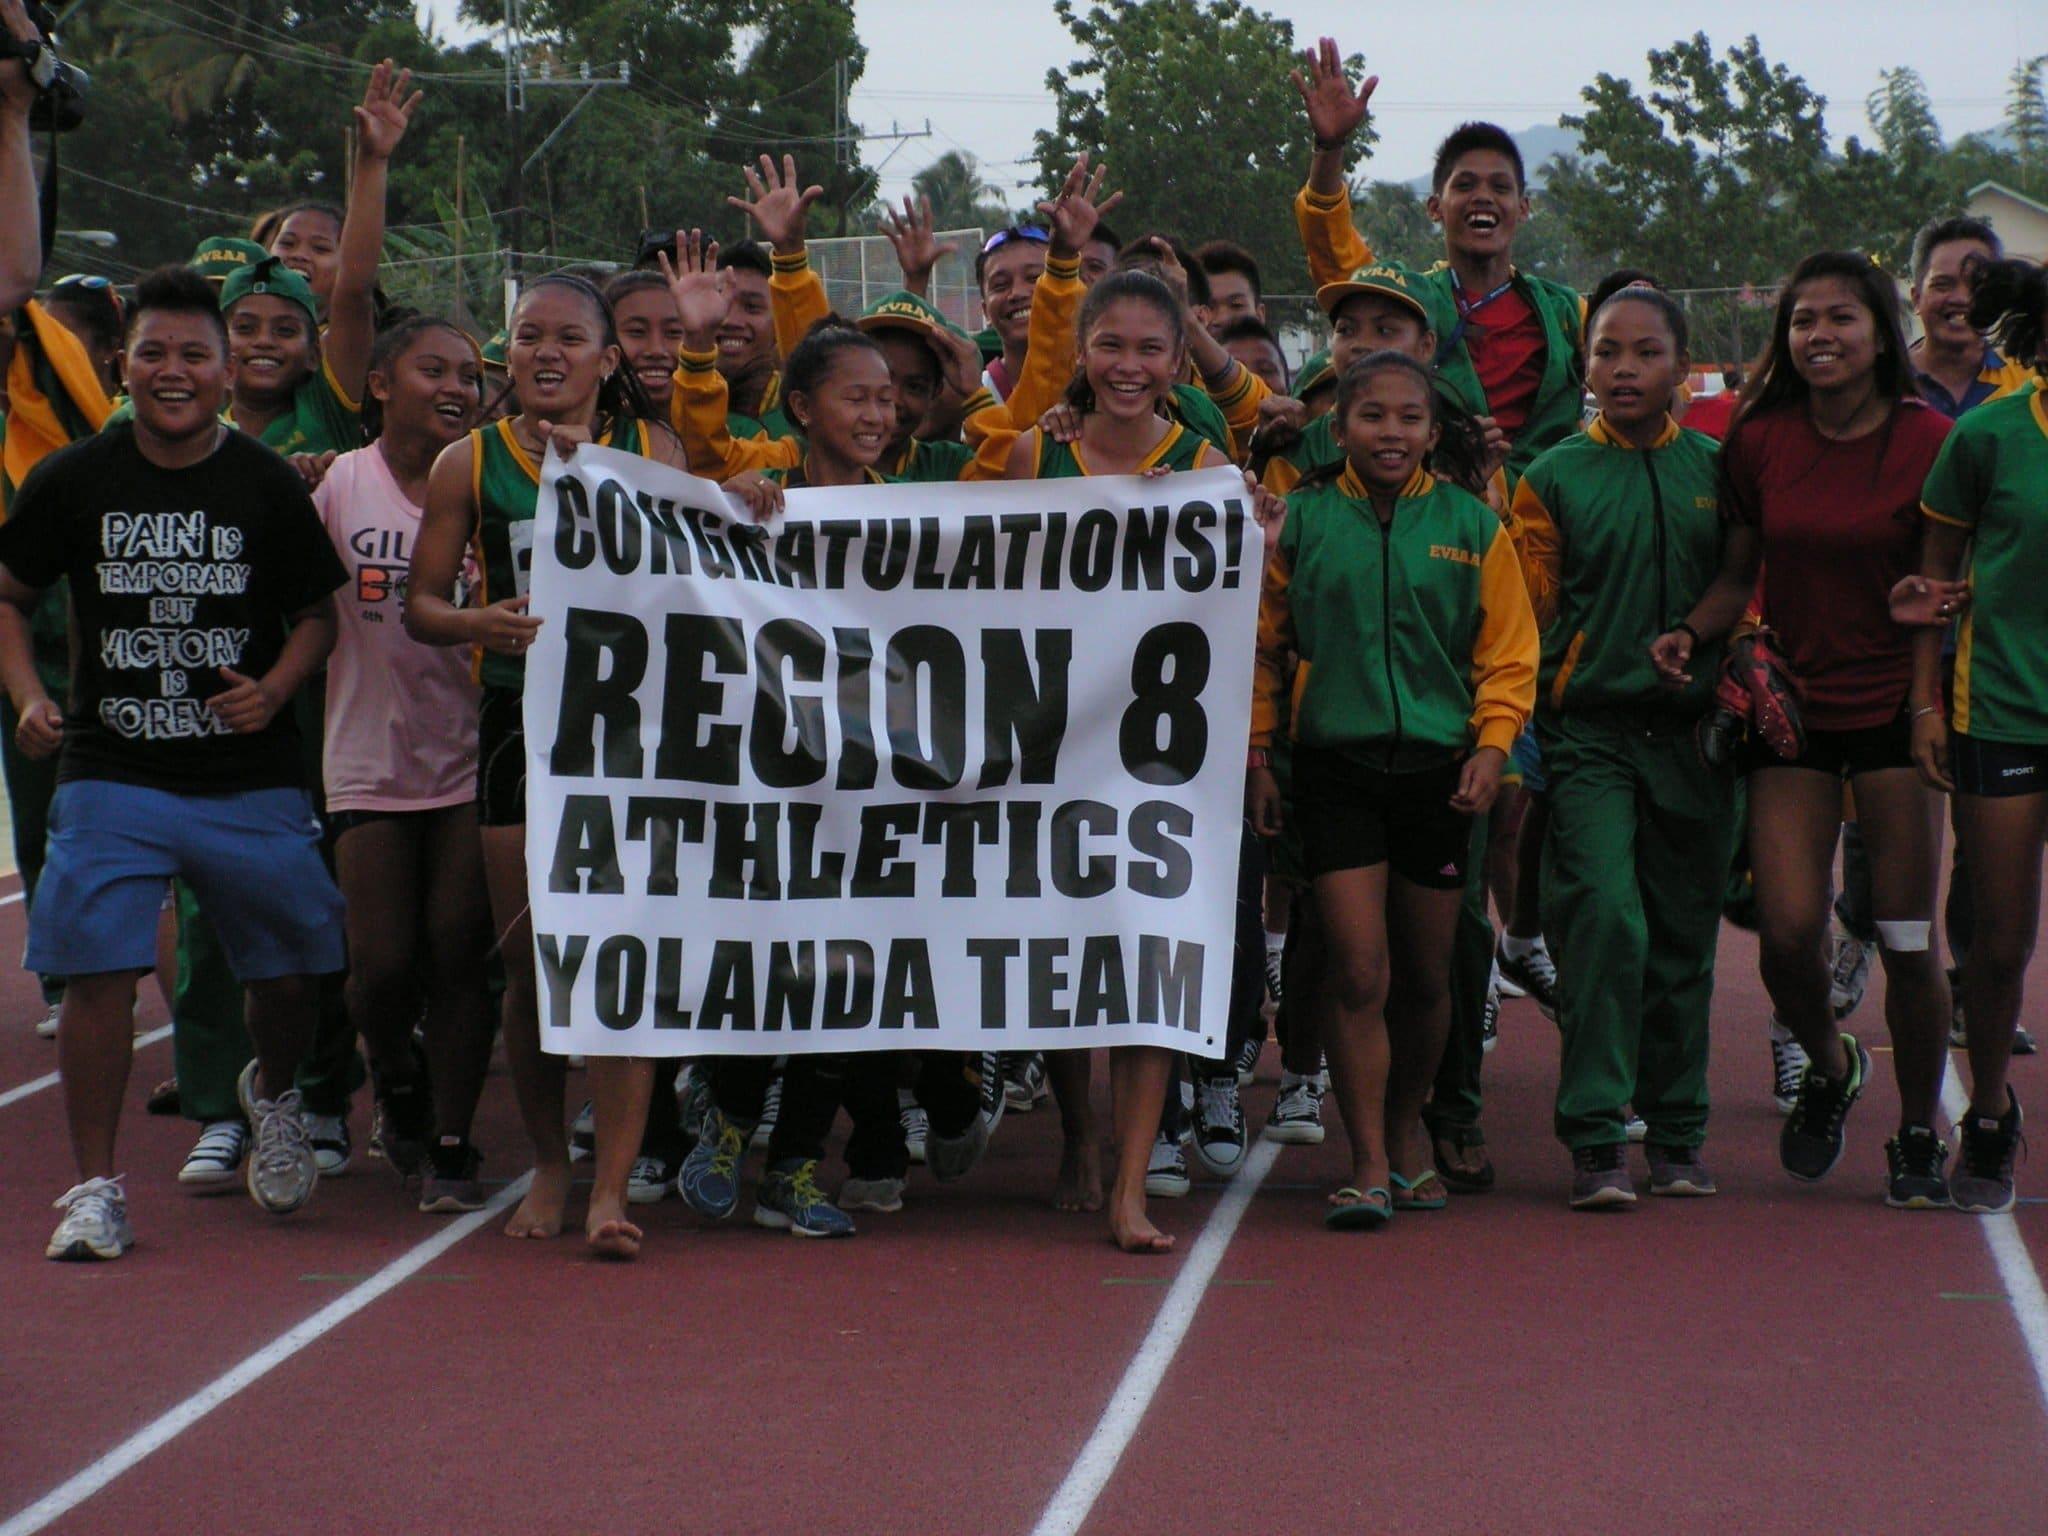 """Team Yplanda"" in their Victory March."